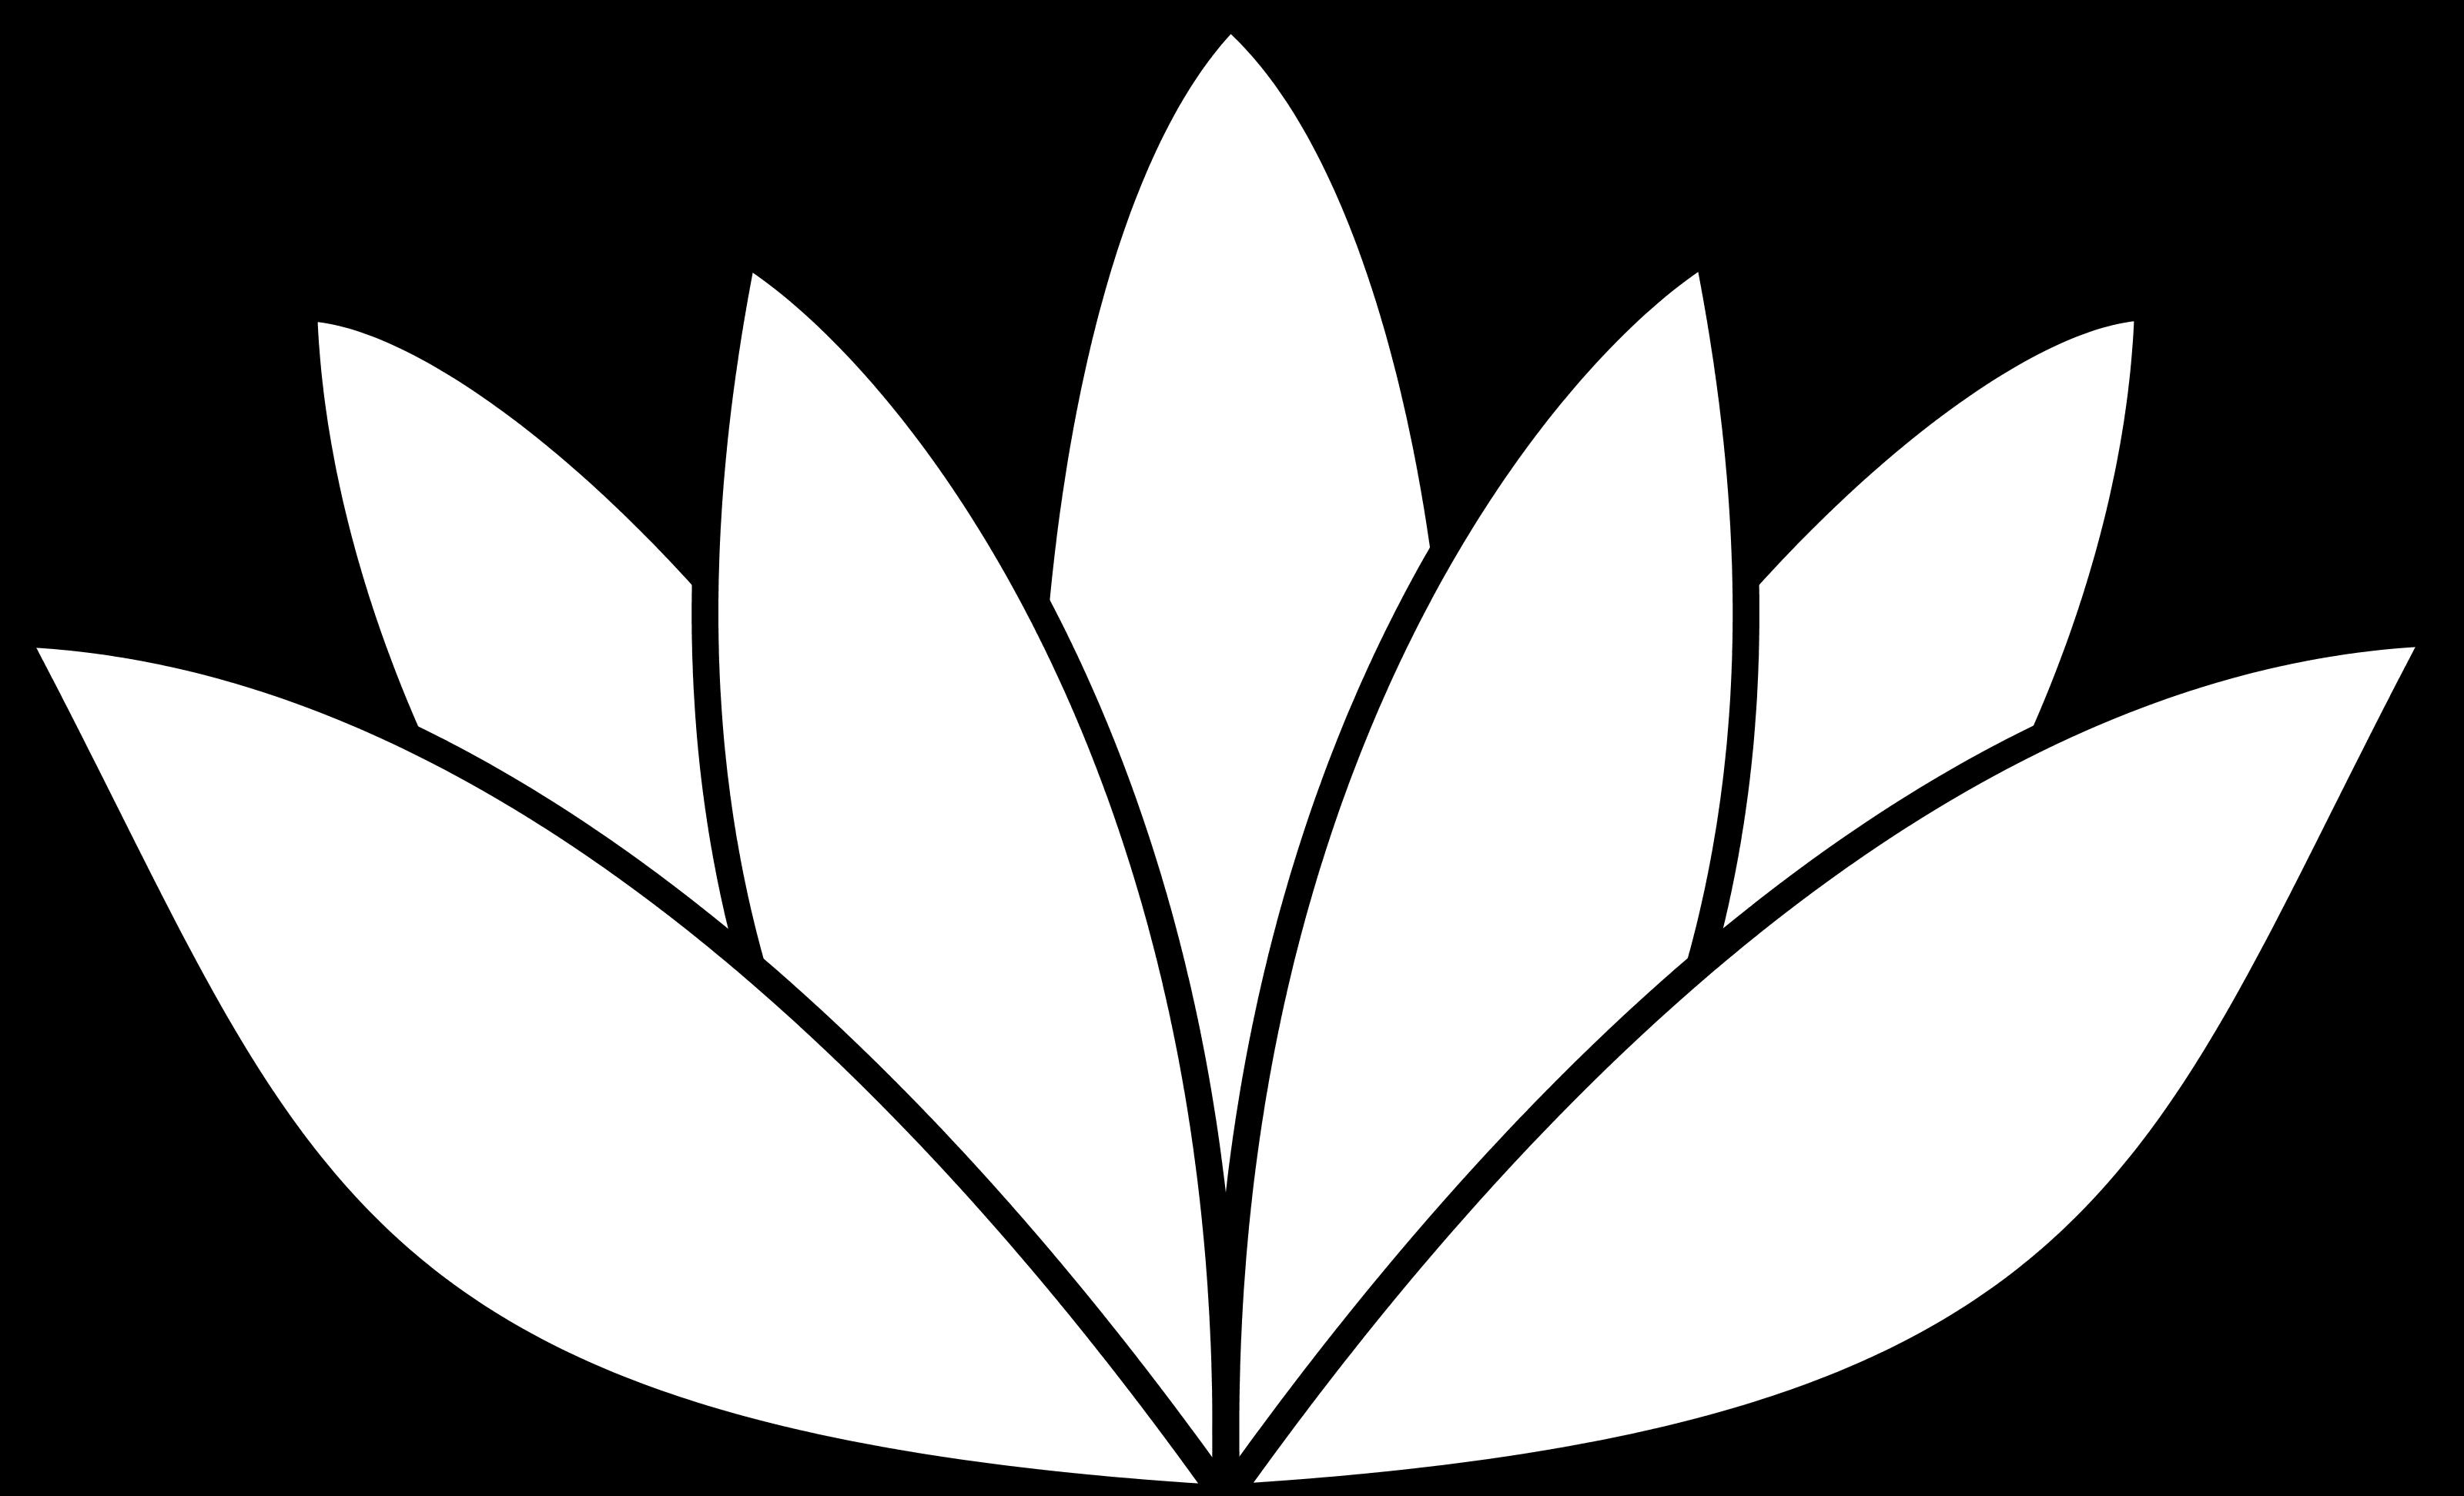 White lotus flower svg clipart best clipart best lovely things white lotus flower svg clipart best clipart best izmirmasajfo